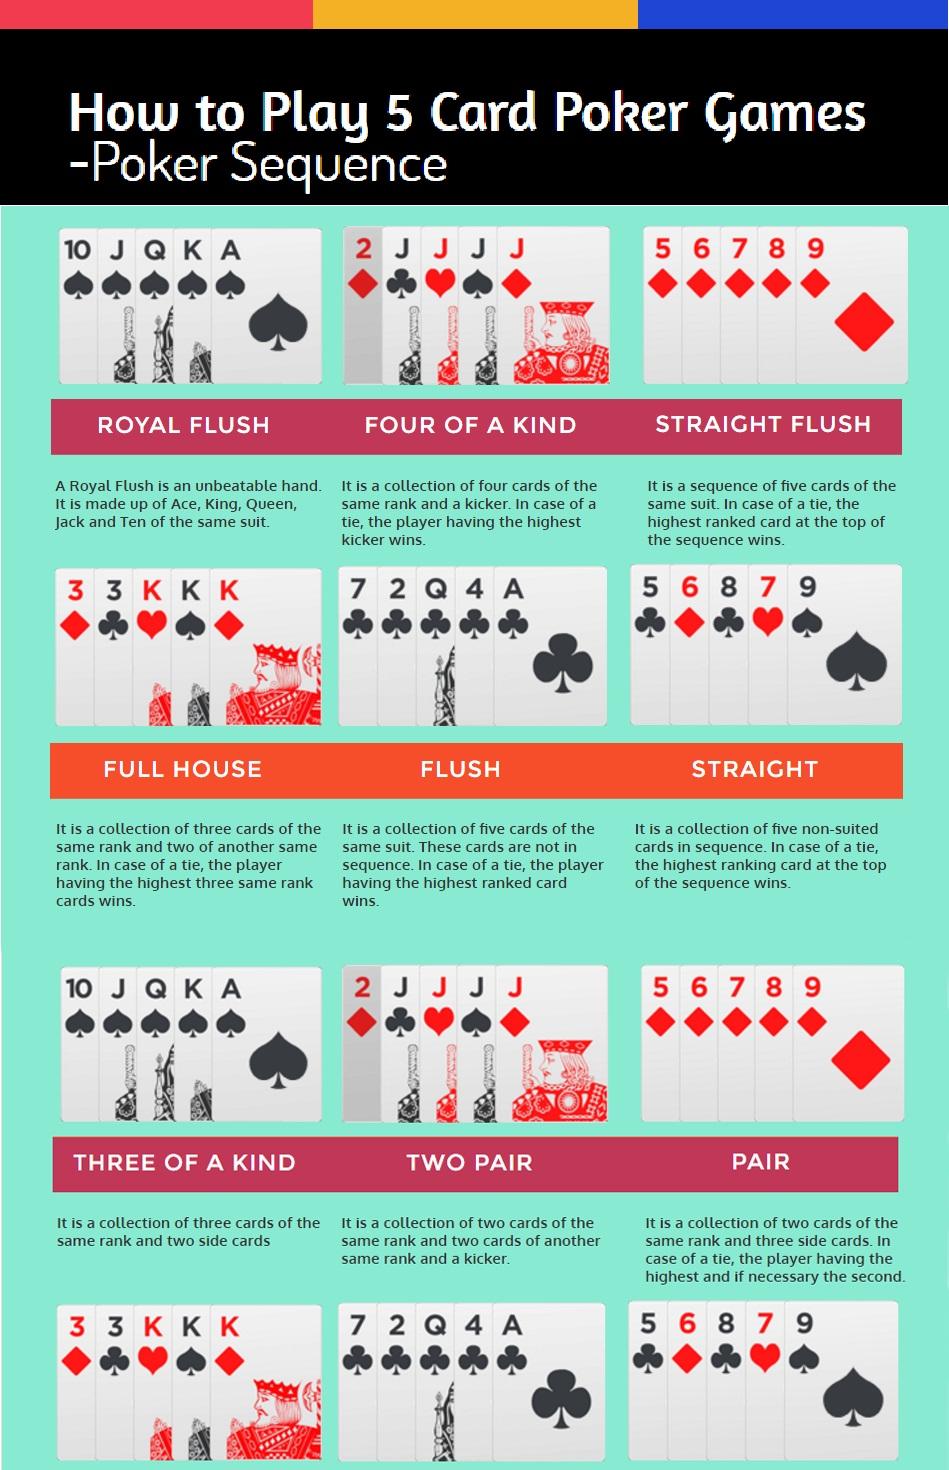 Straight Poker Rules